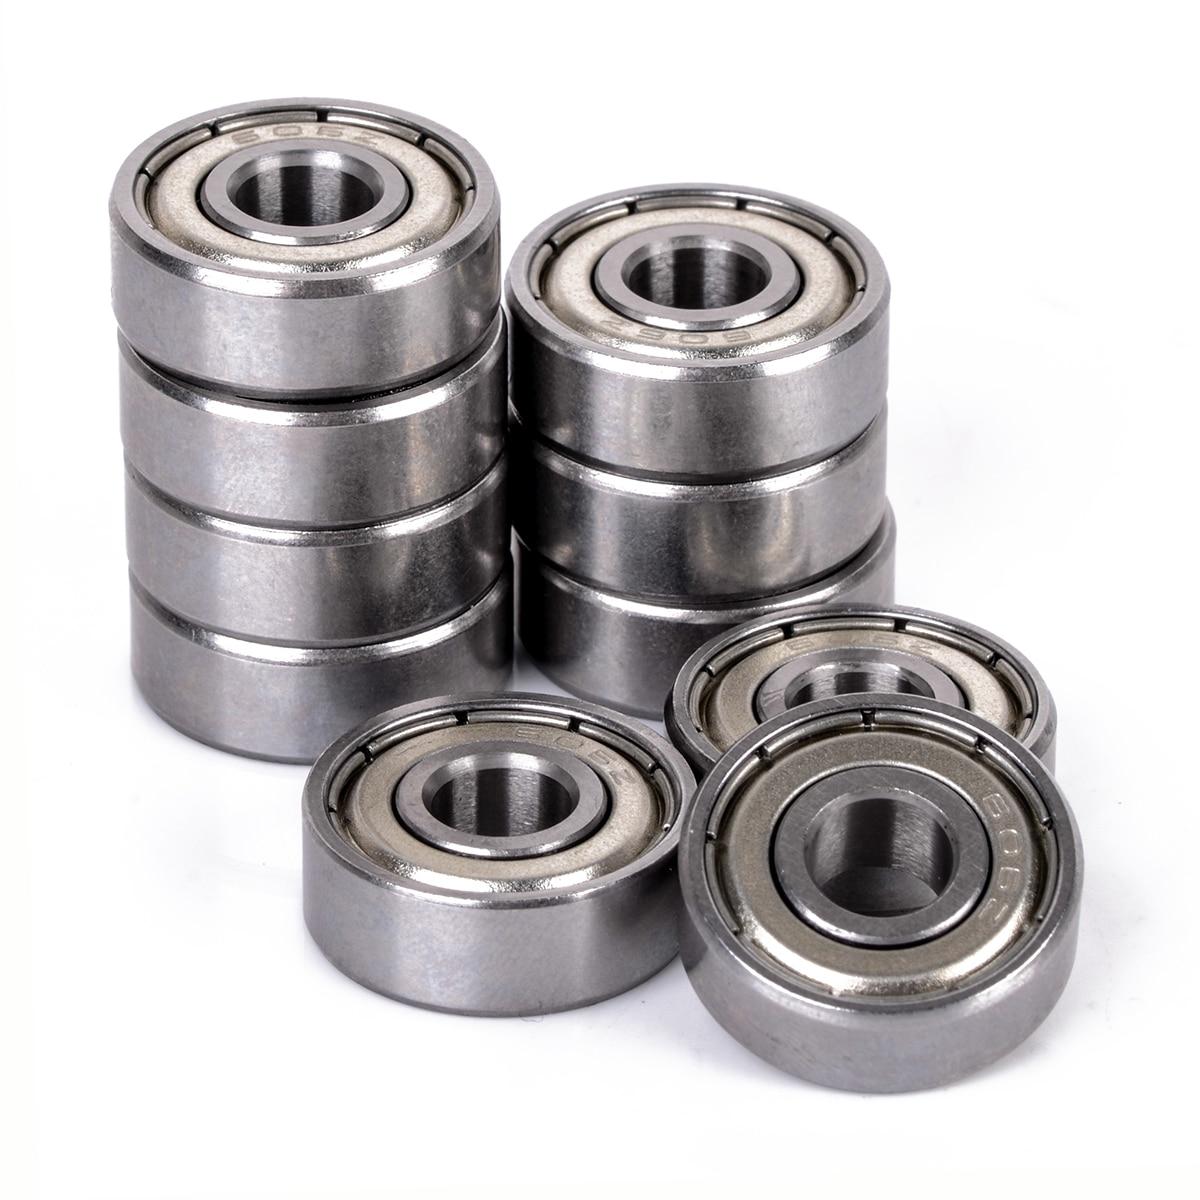 10Pcs//set Metal 606ZZ Miniature Deep Groove Shielded Ball Bearings 6*17*6 mm XS